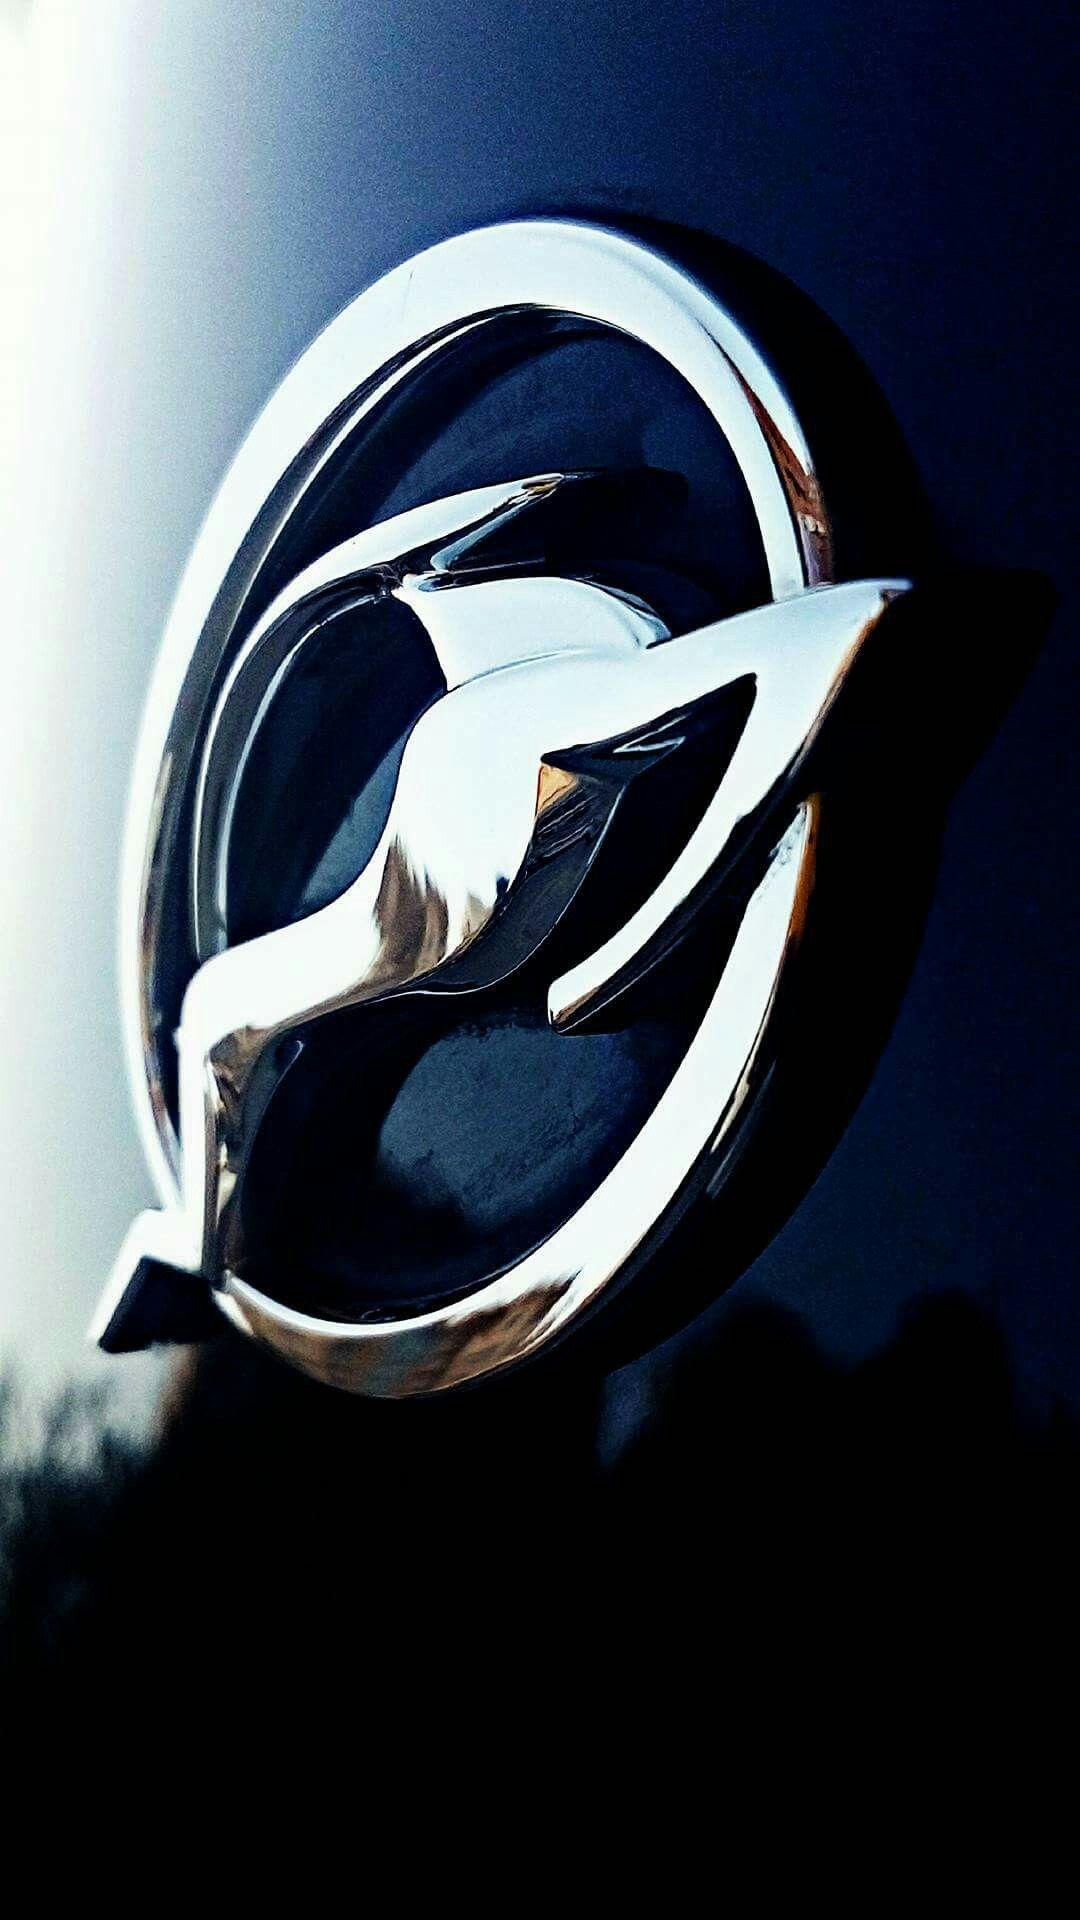 Impala chevrolet impala Impala, Chevrolet, Street